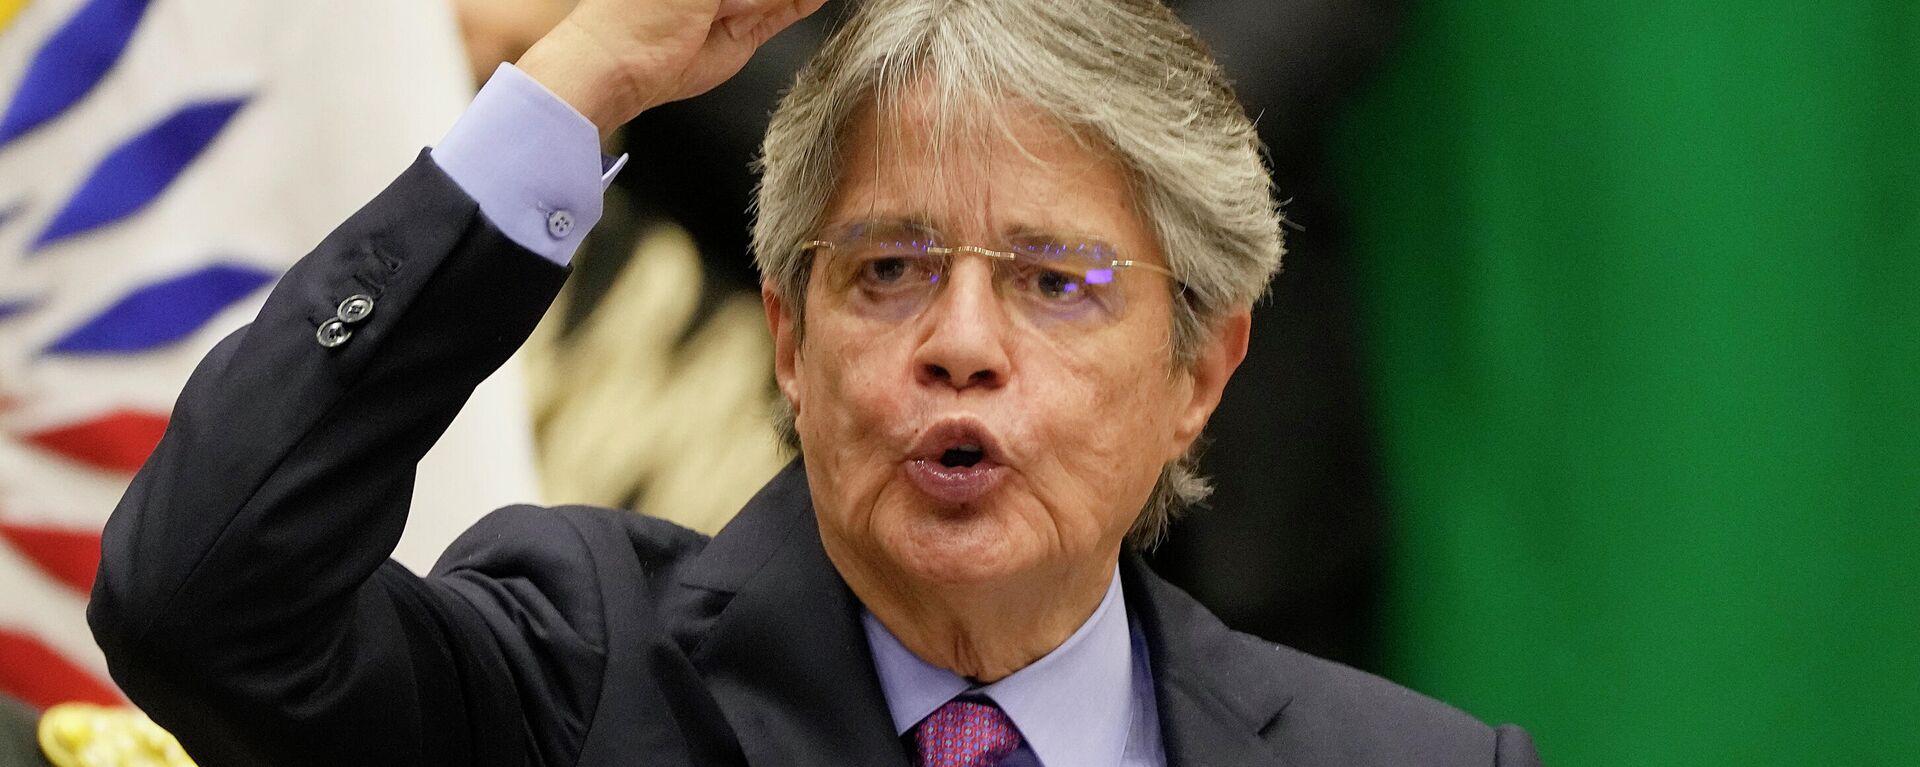 Guillermo Lasso, presidente de Ecuador - Sputnik Mundo, 1920, 13.10.2021